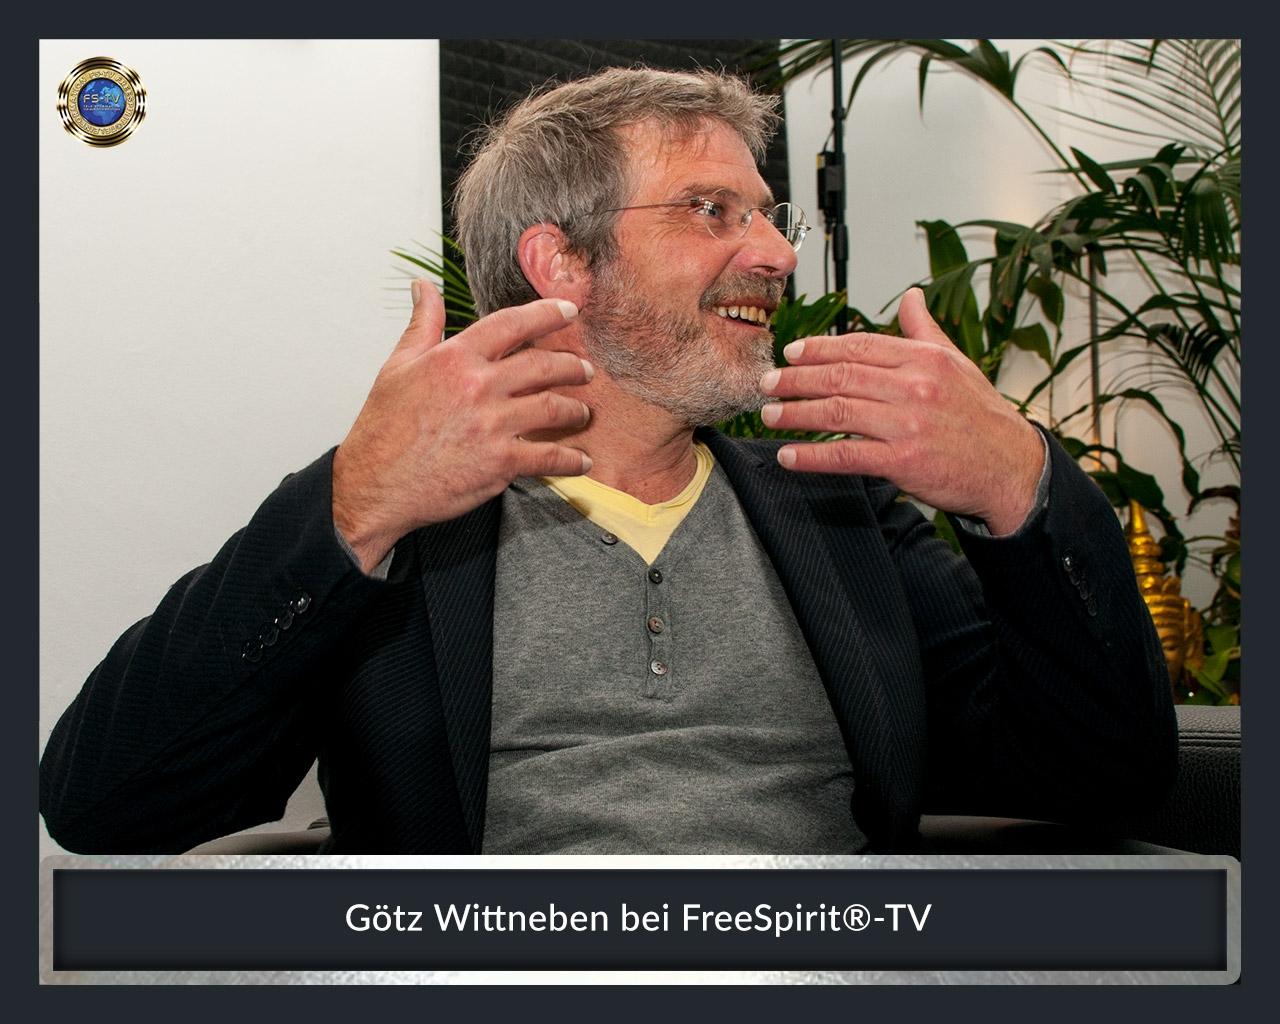 FS-TV-Bildergallerie-Götz-Wittneben-5